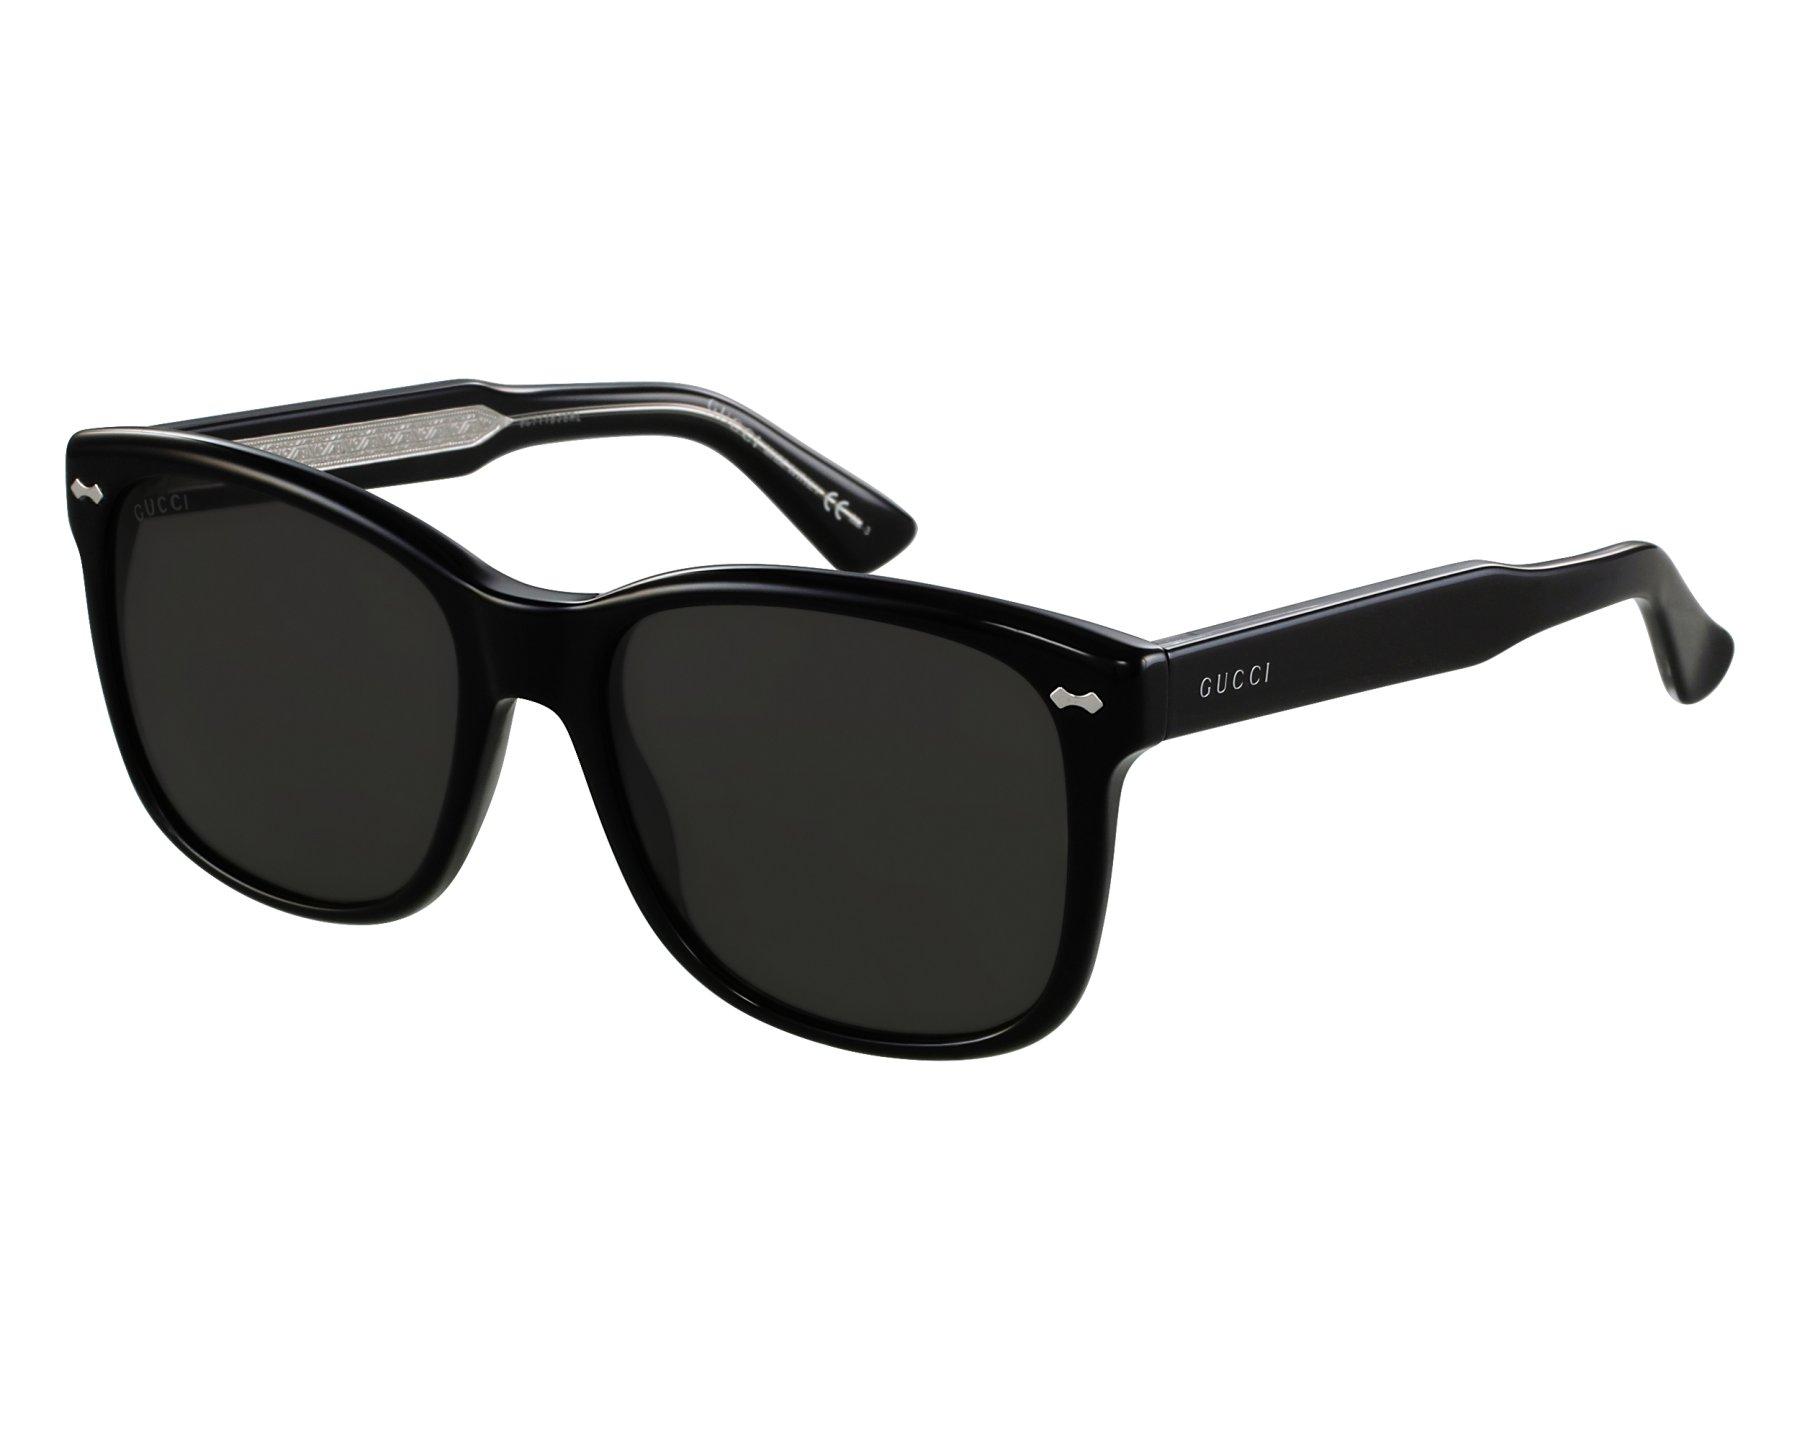 Gucci Sonnenbrille (GG 1134/S Y6C/NR 56) 32bPQ